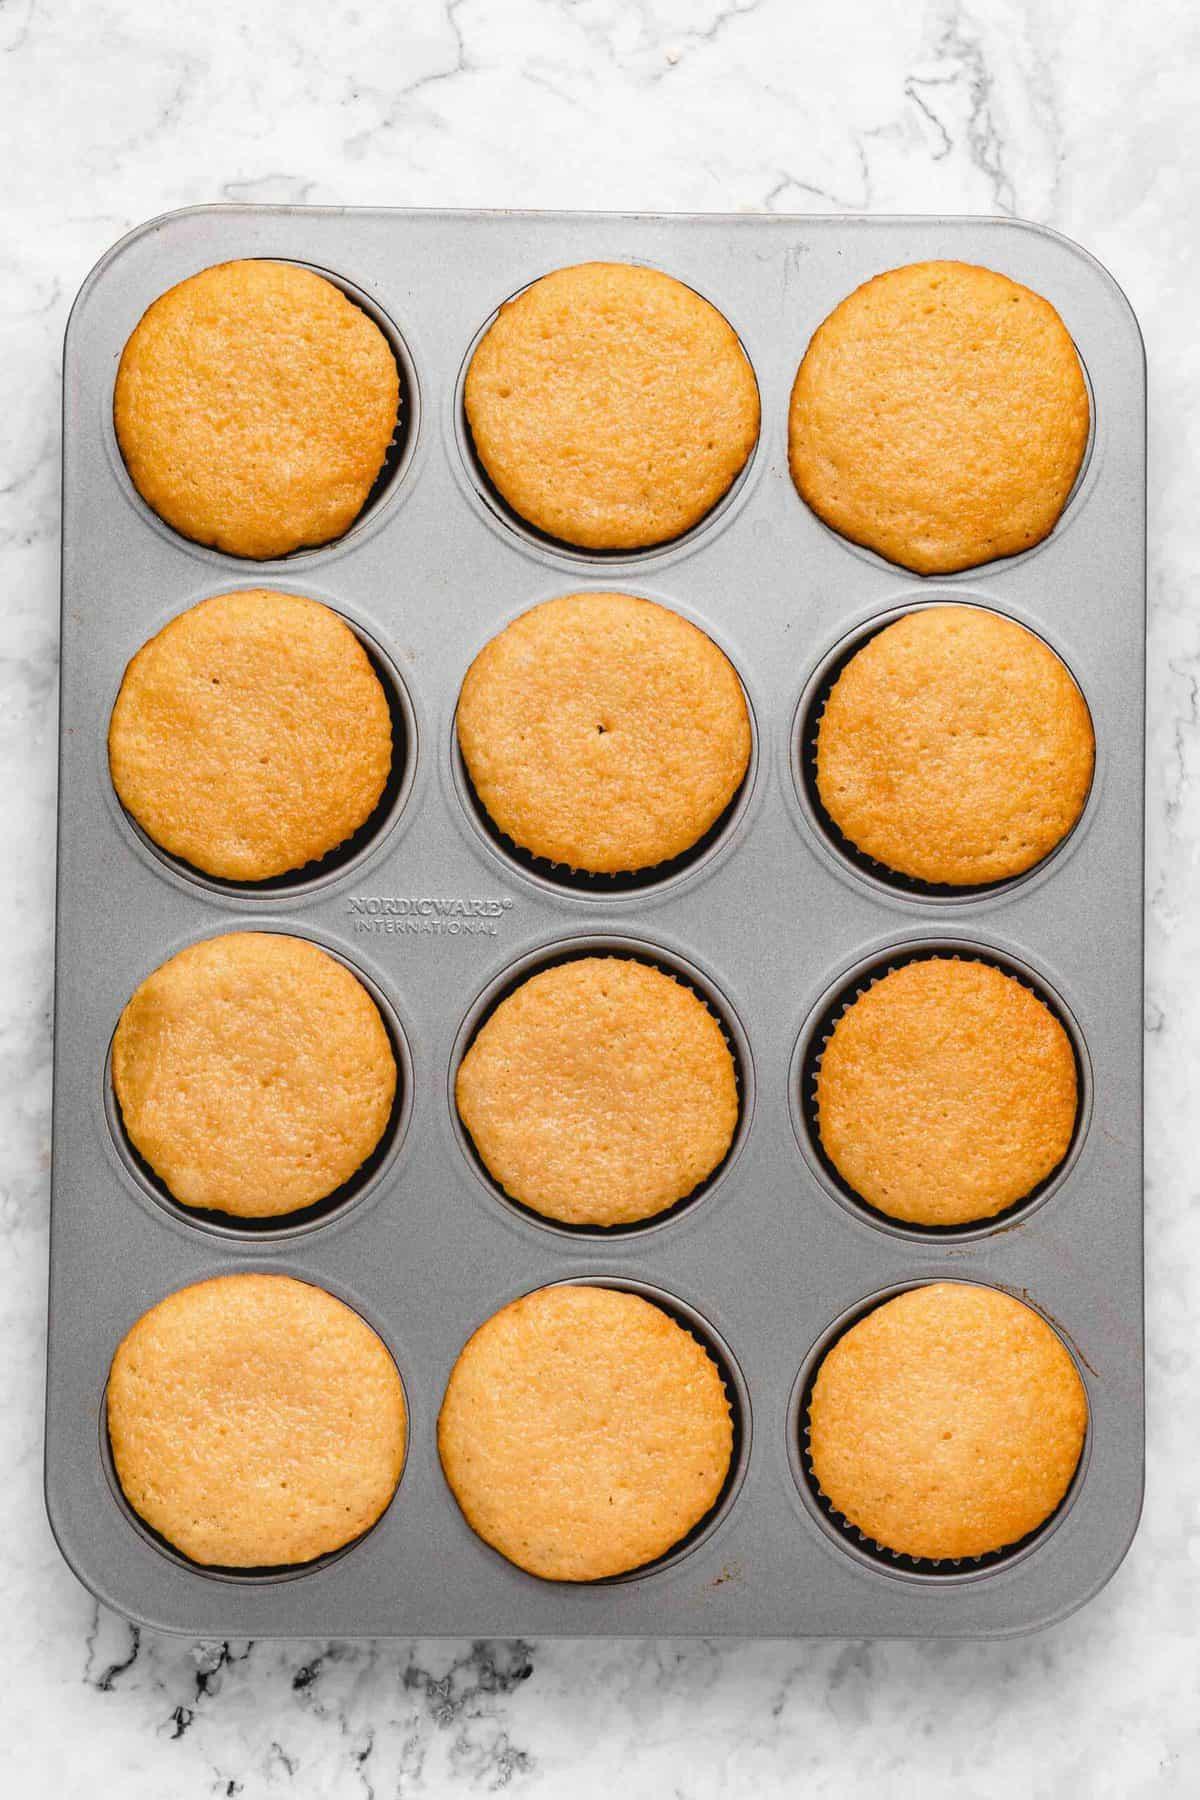 Baked cupcakes in a cupcake pan.